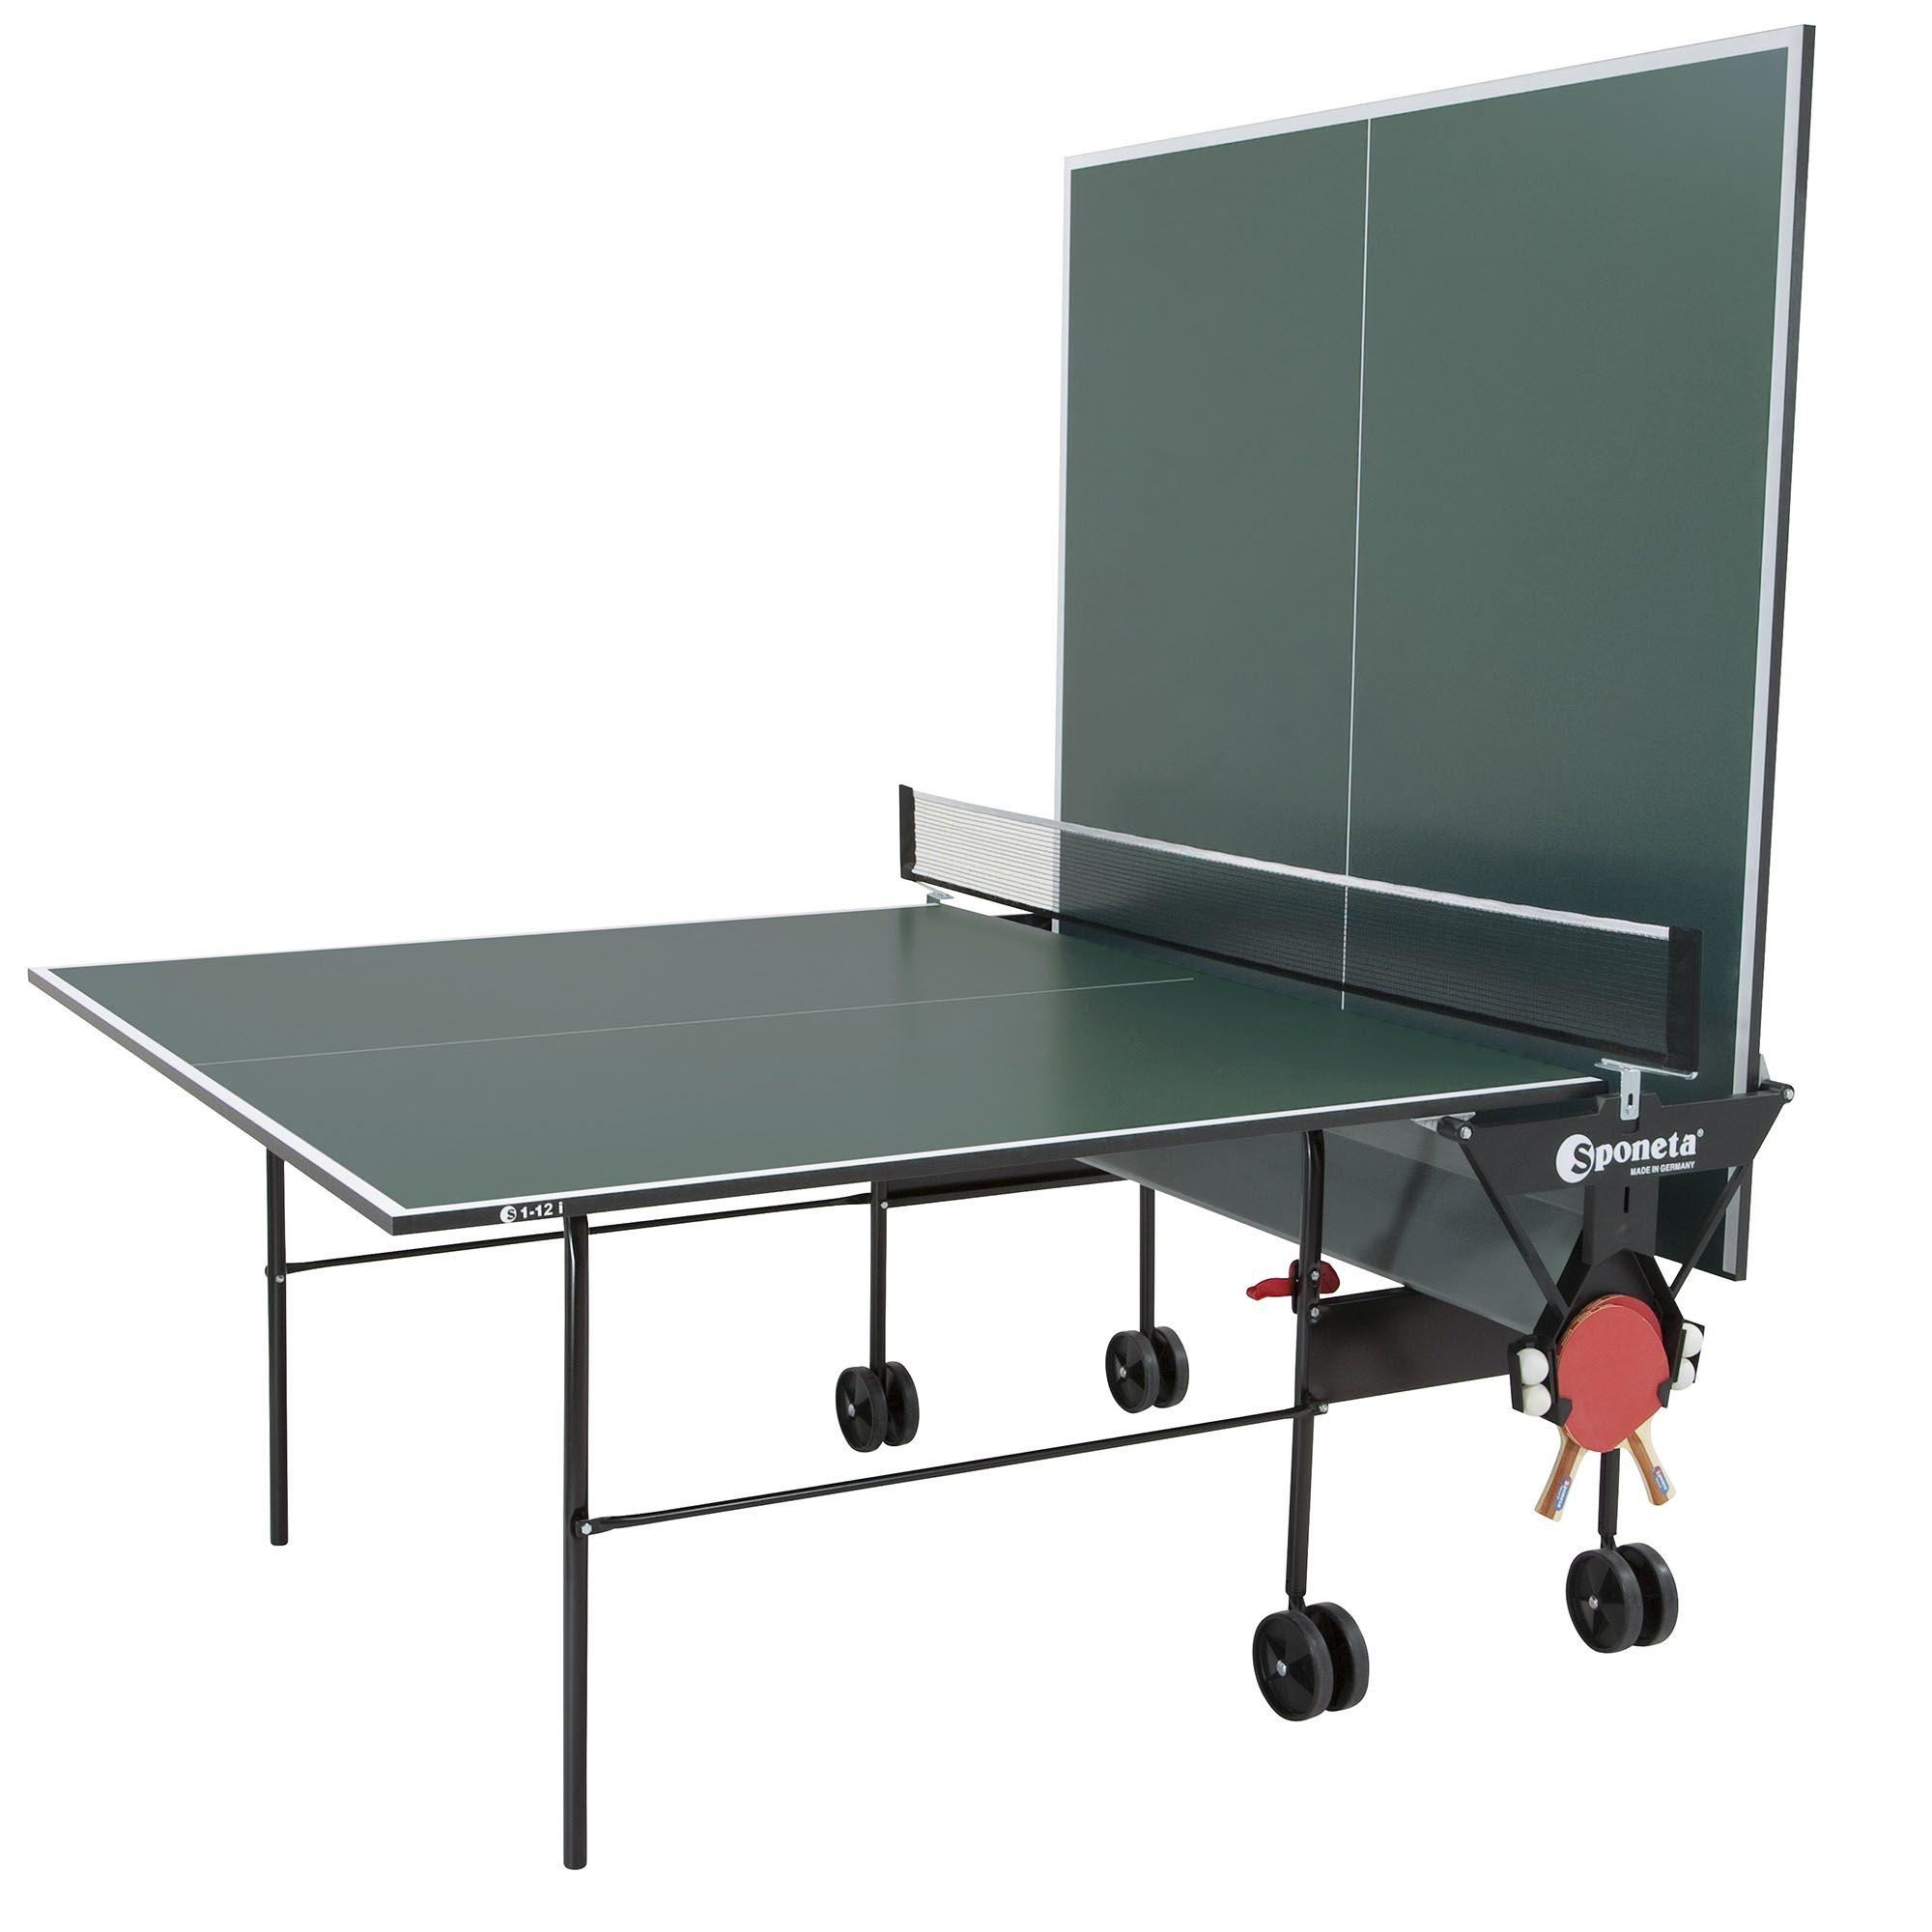 Sponeta hobby playback indoor table tennis table - Sponeta table tennis table ...